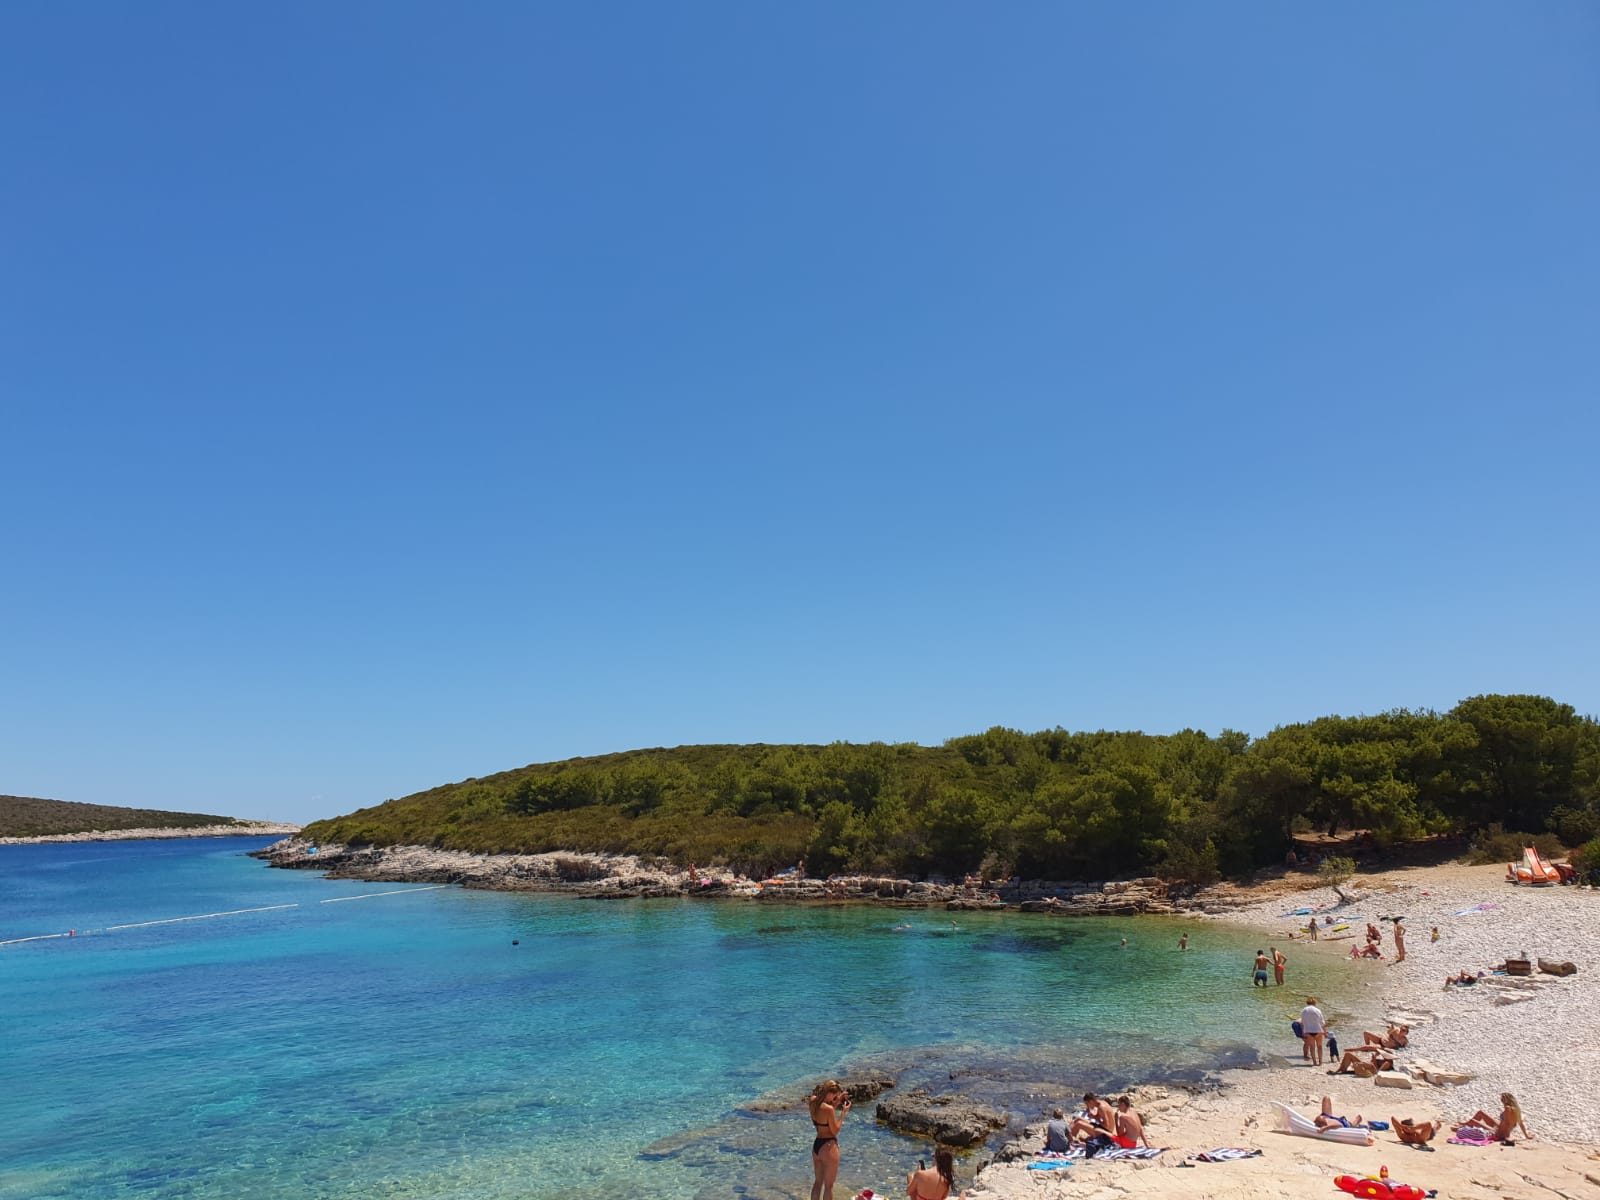 Beach Porat on Bisevo Island